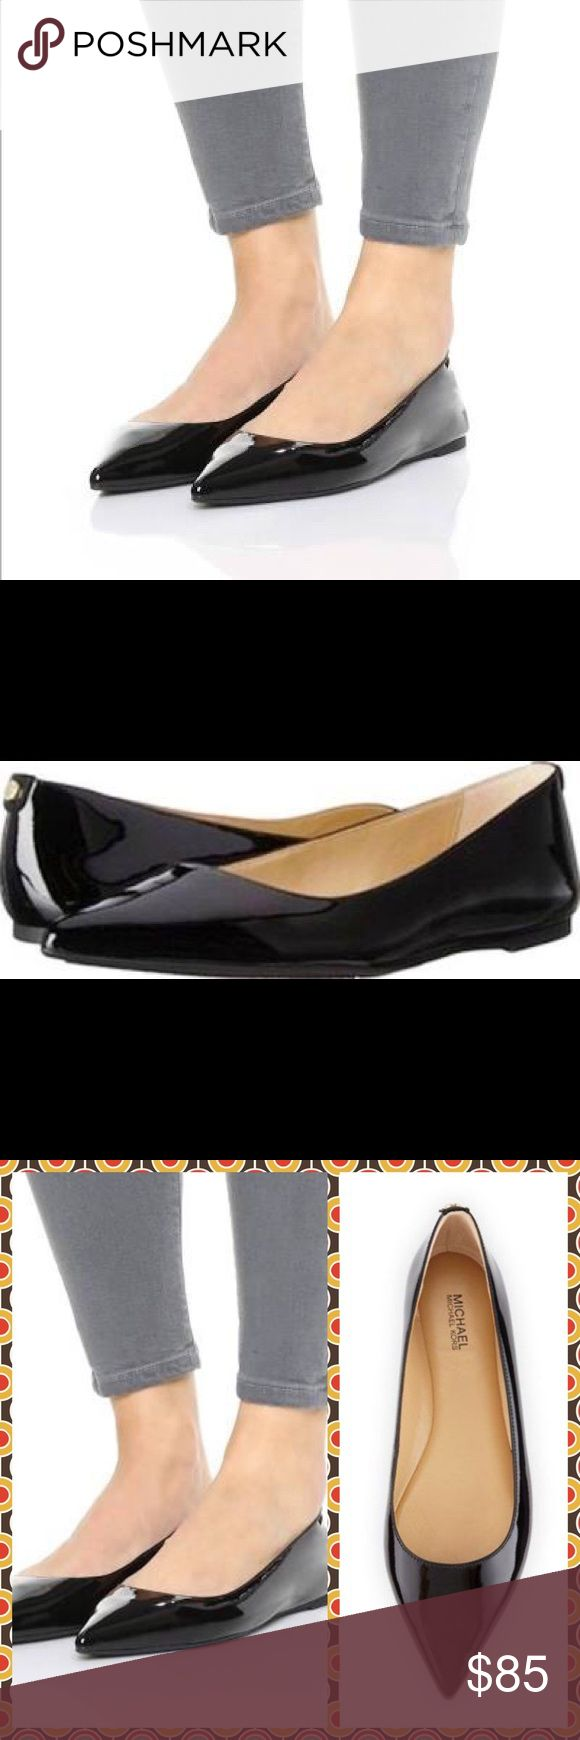 Michael Kors Black Patent Leather Shoe Michael Kors Arianna Black Pointed Toe Flat Shoe, NWOTB. MICHAEL Michael Kors Shoes Flats & Loafers